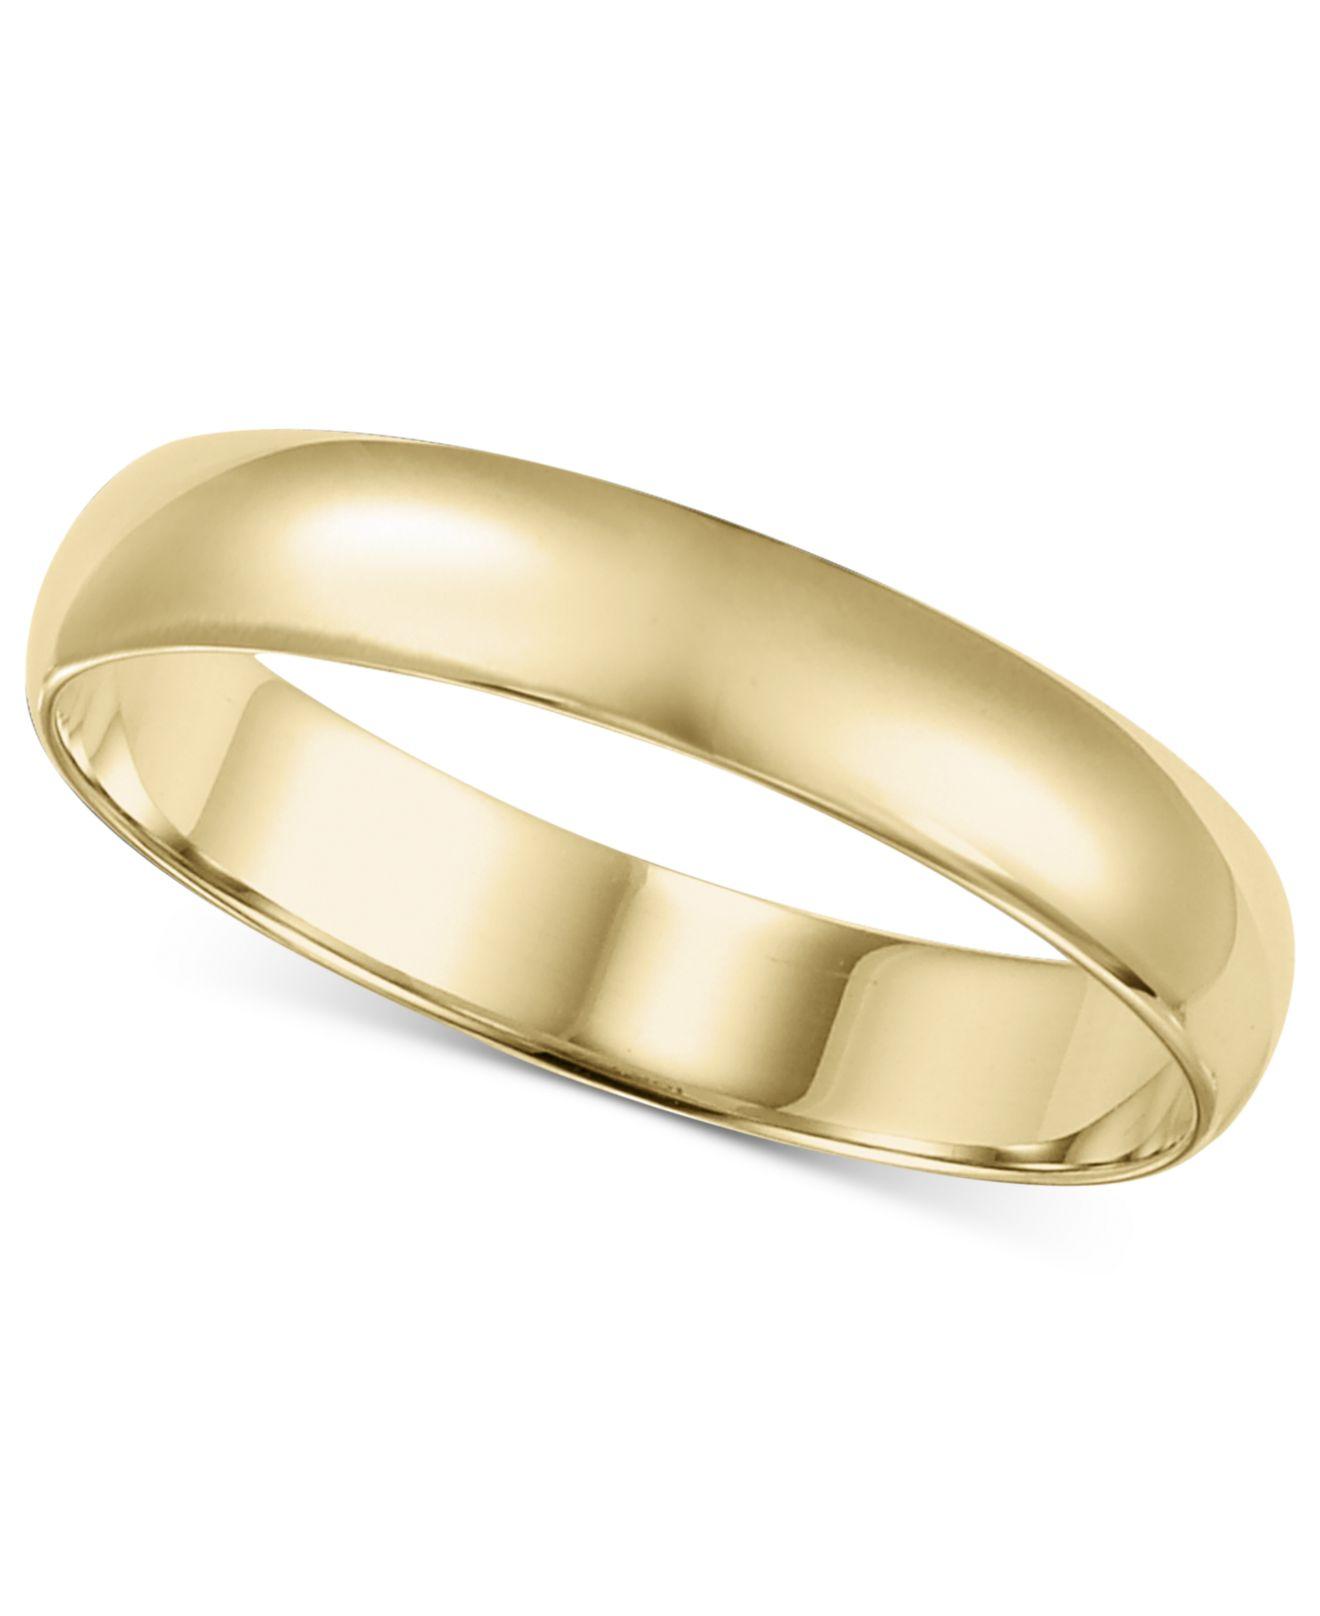 Macys Mens Wedding Rings: Macy's 14k Gold 4mm Wedding Band In Metallic For Men